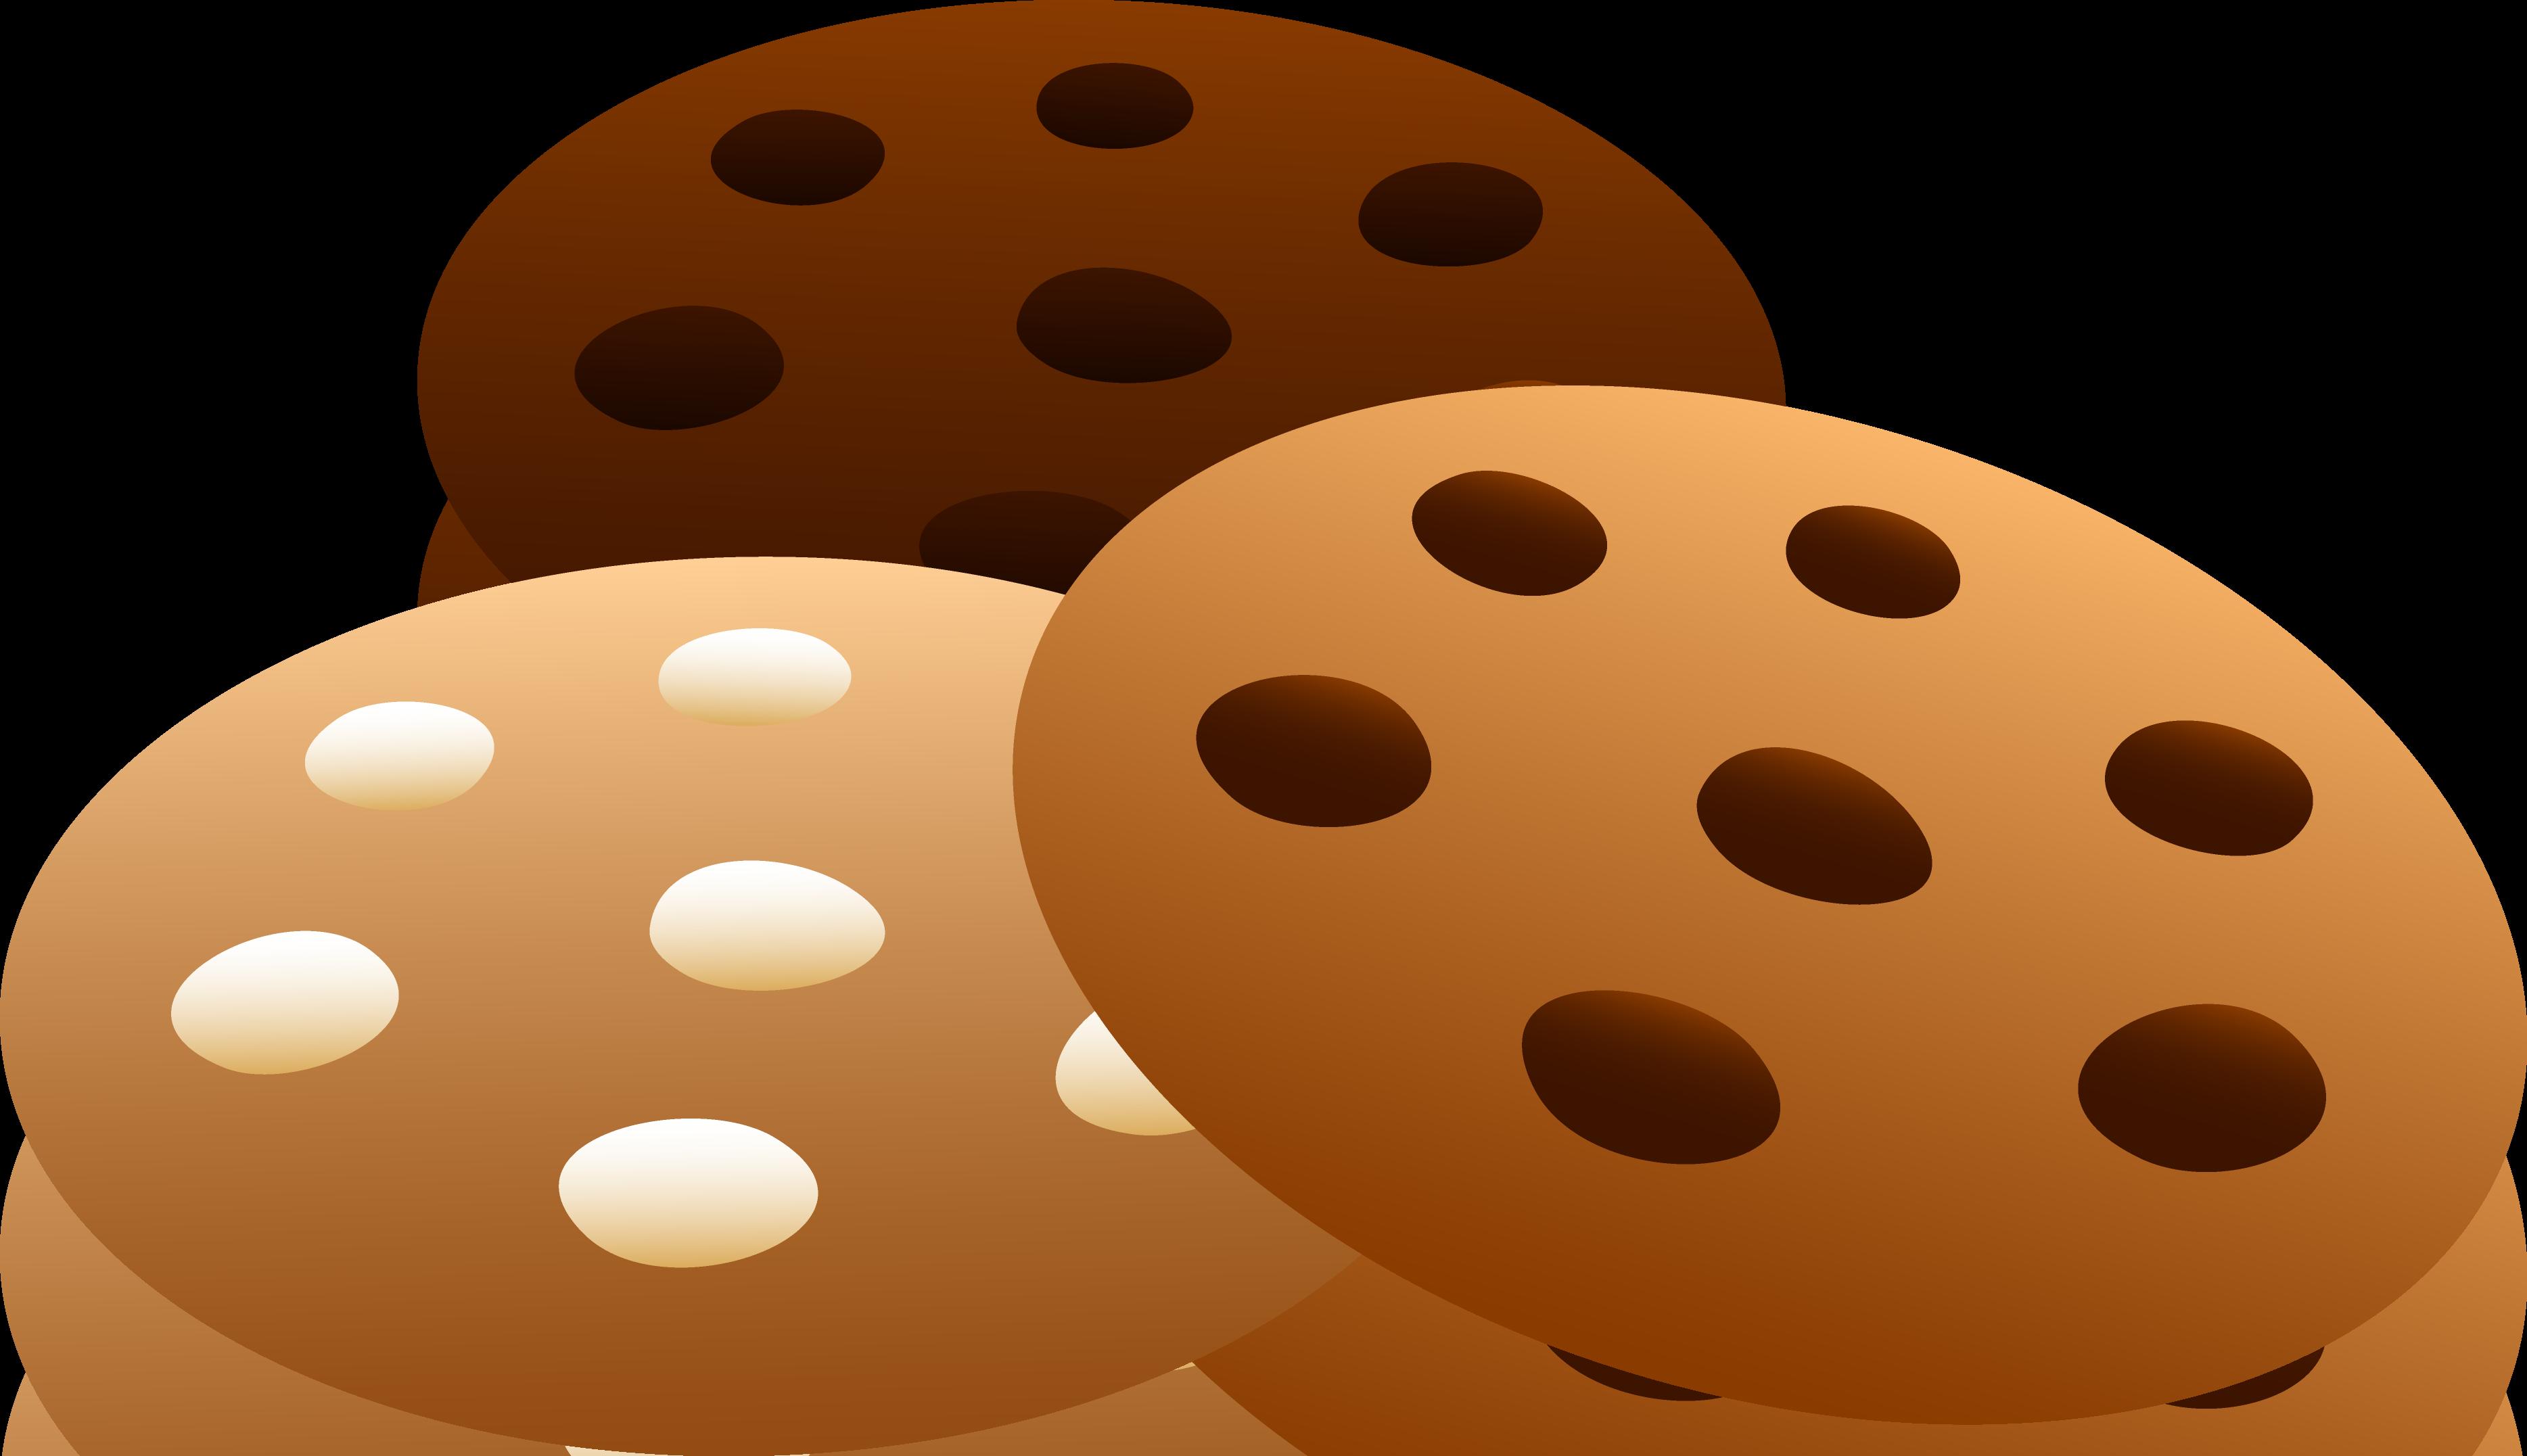 Clip Art Cookies Clipart cook - Clip Art Cookie